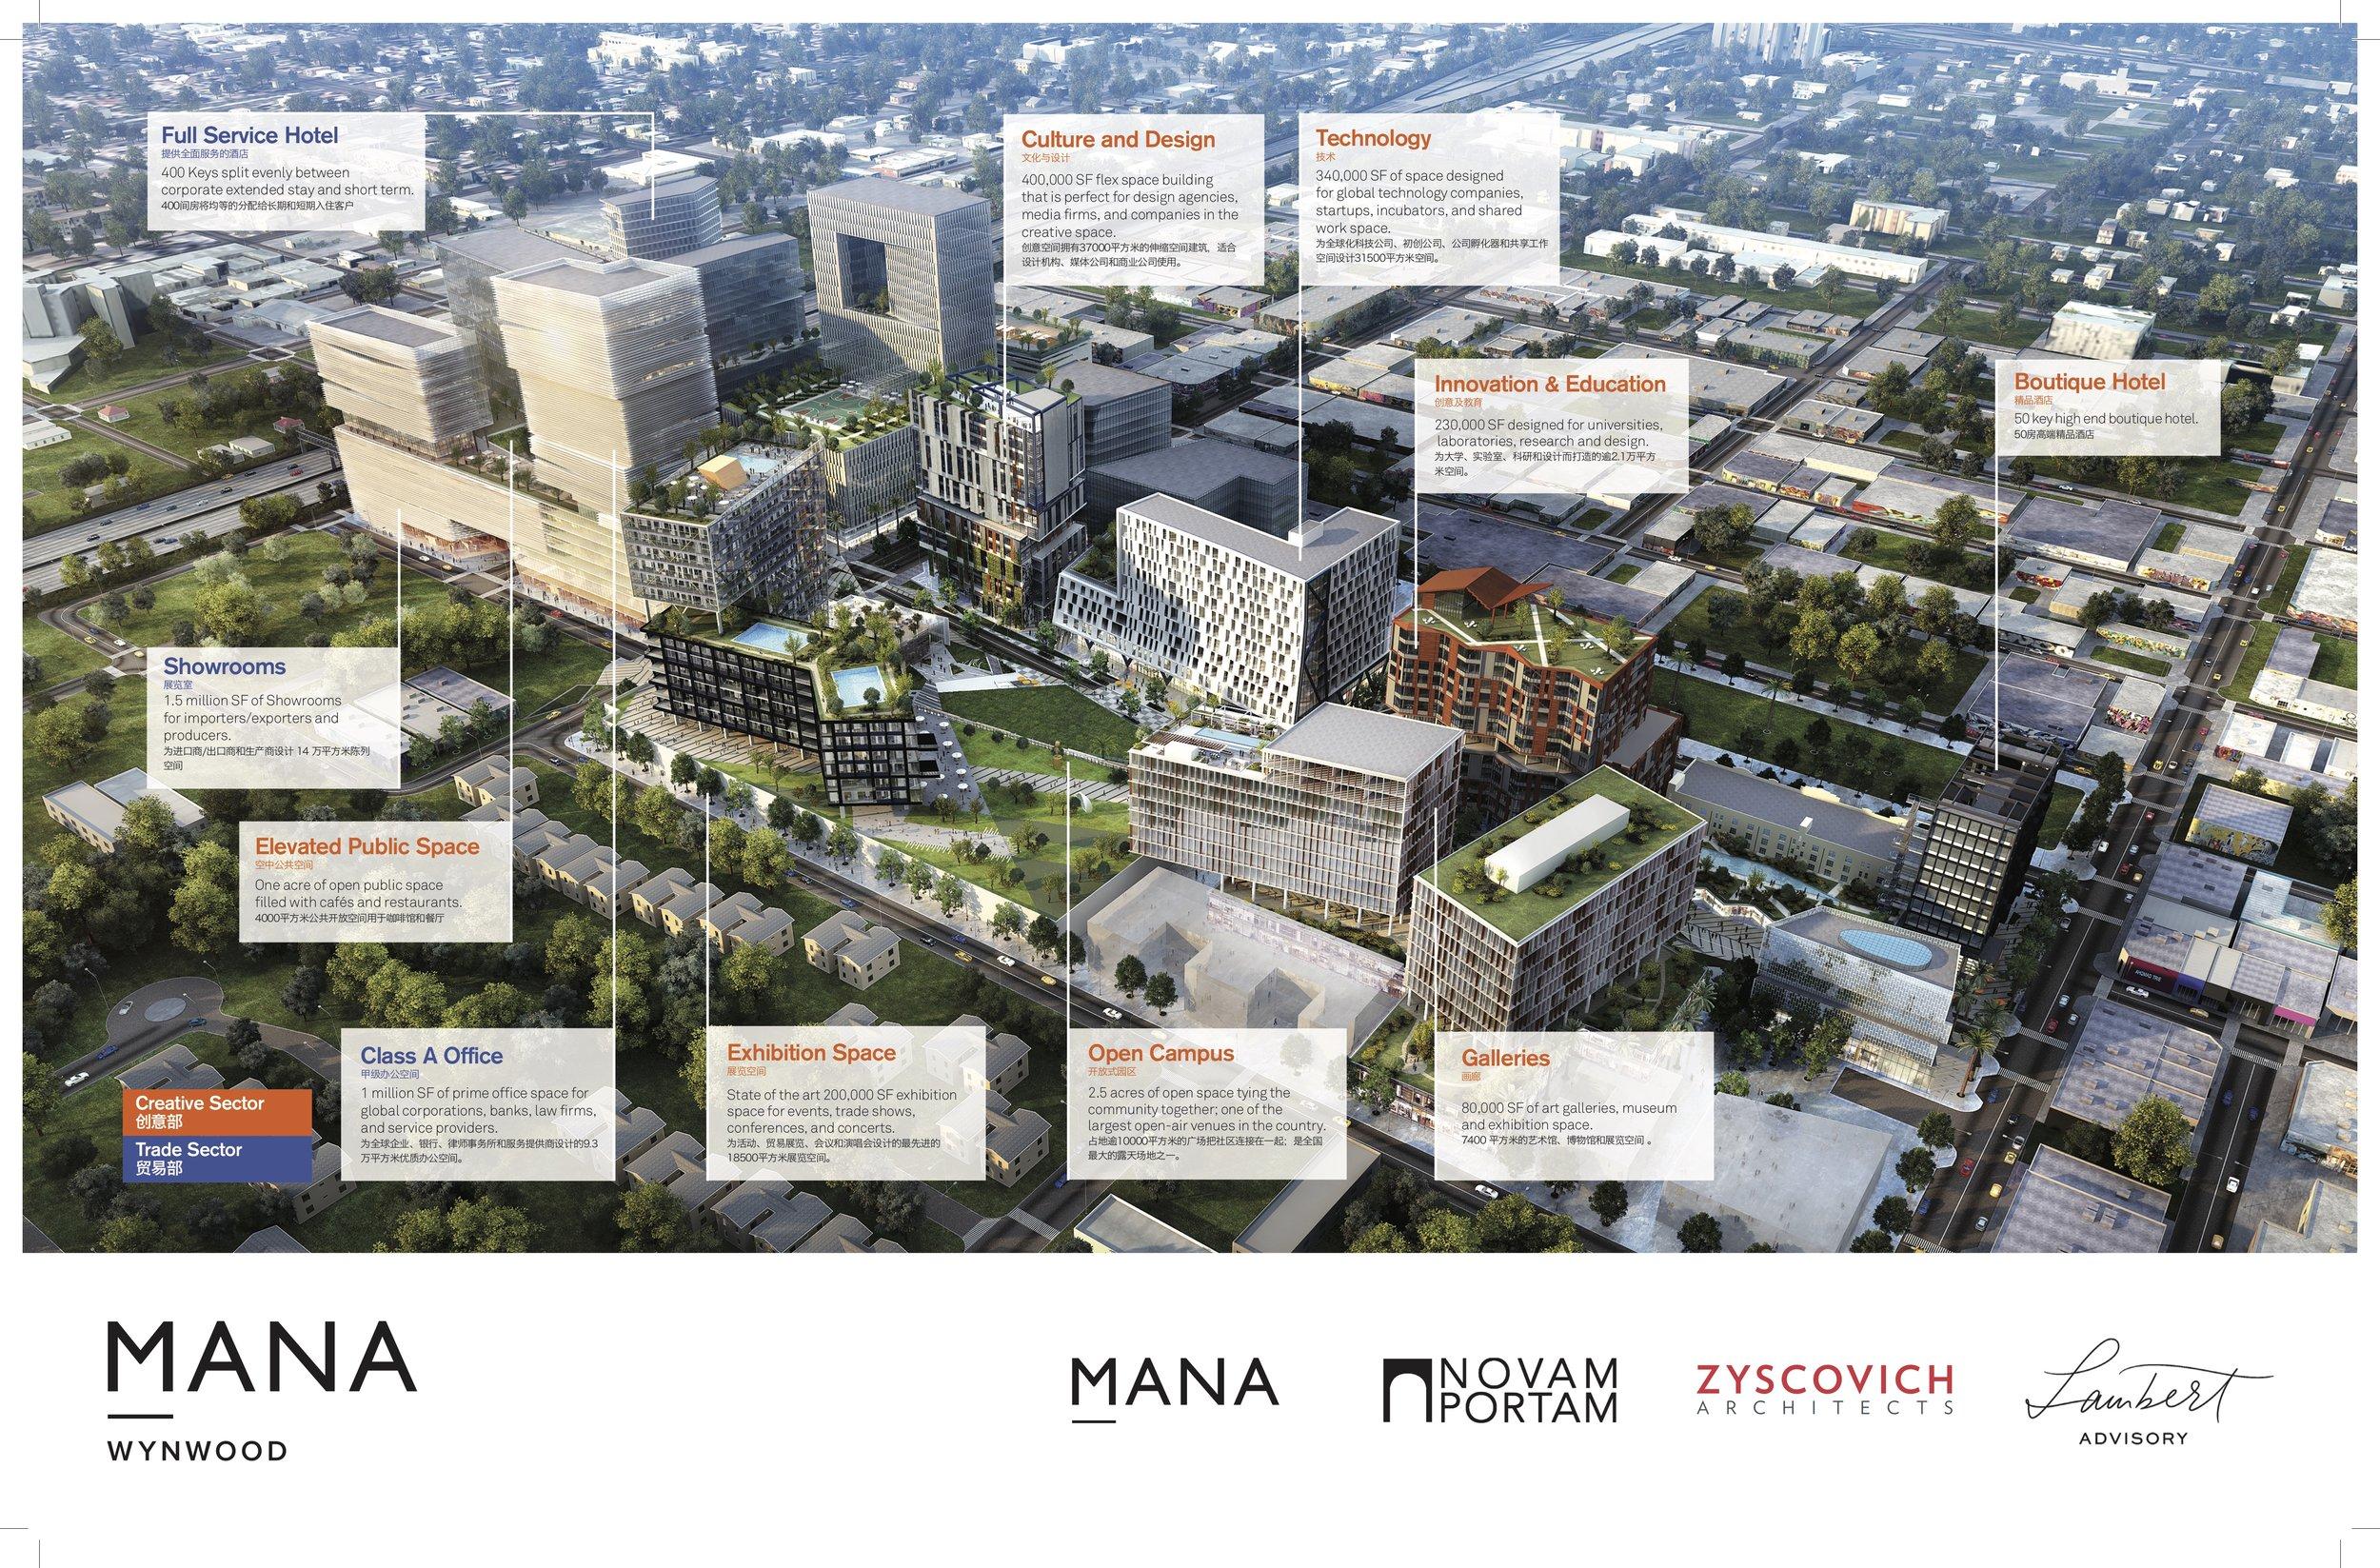 Mana Wynwood Asia Trade Hub Executive Summary